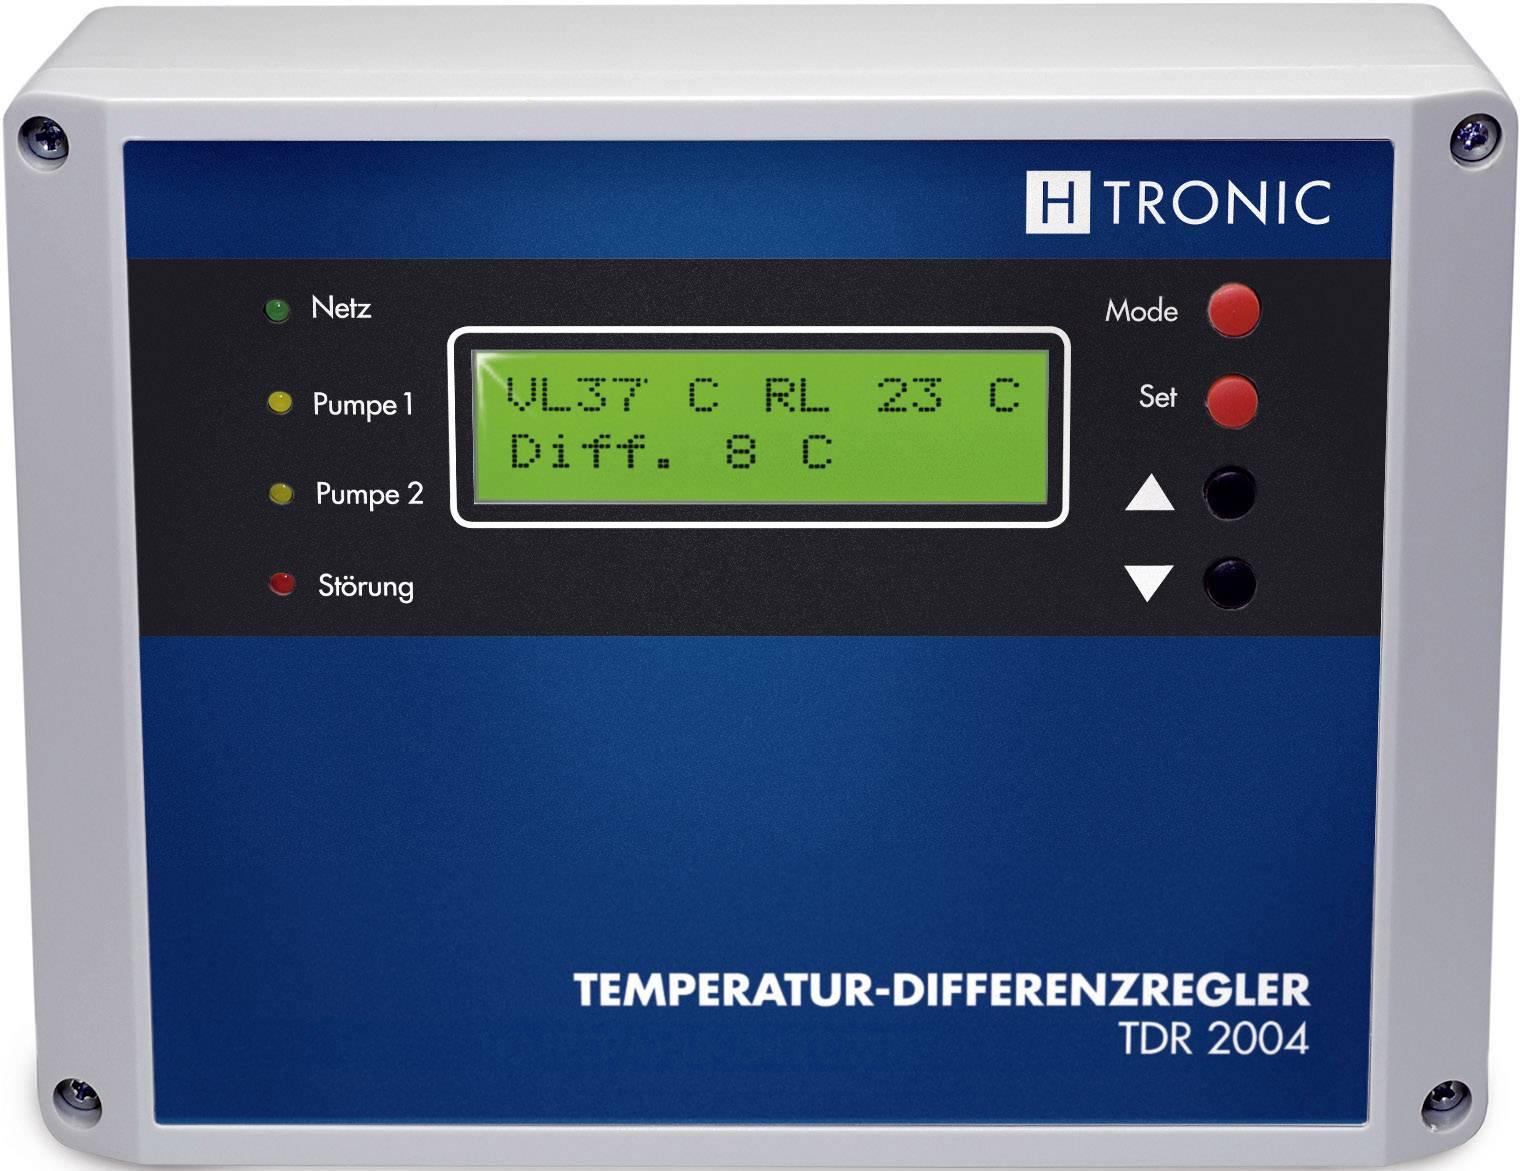 H-Tronic 110990, TDR 2004